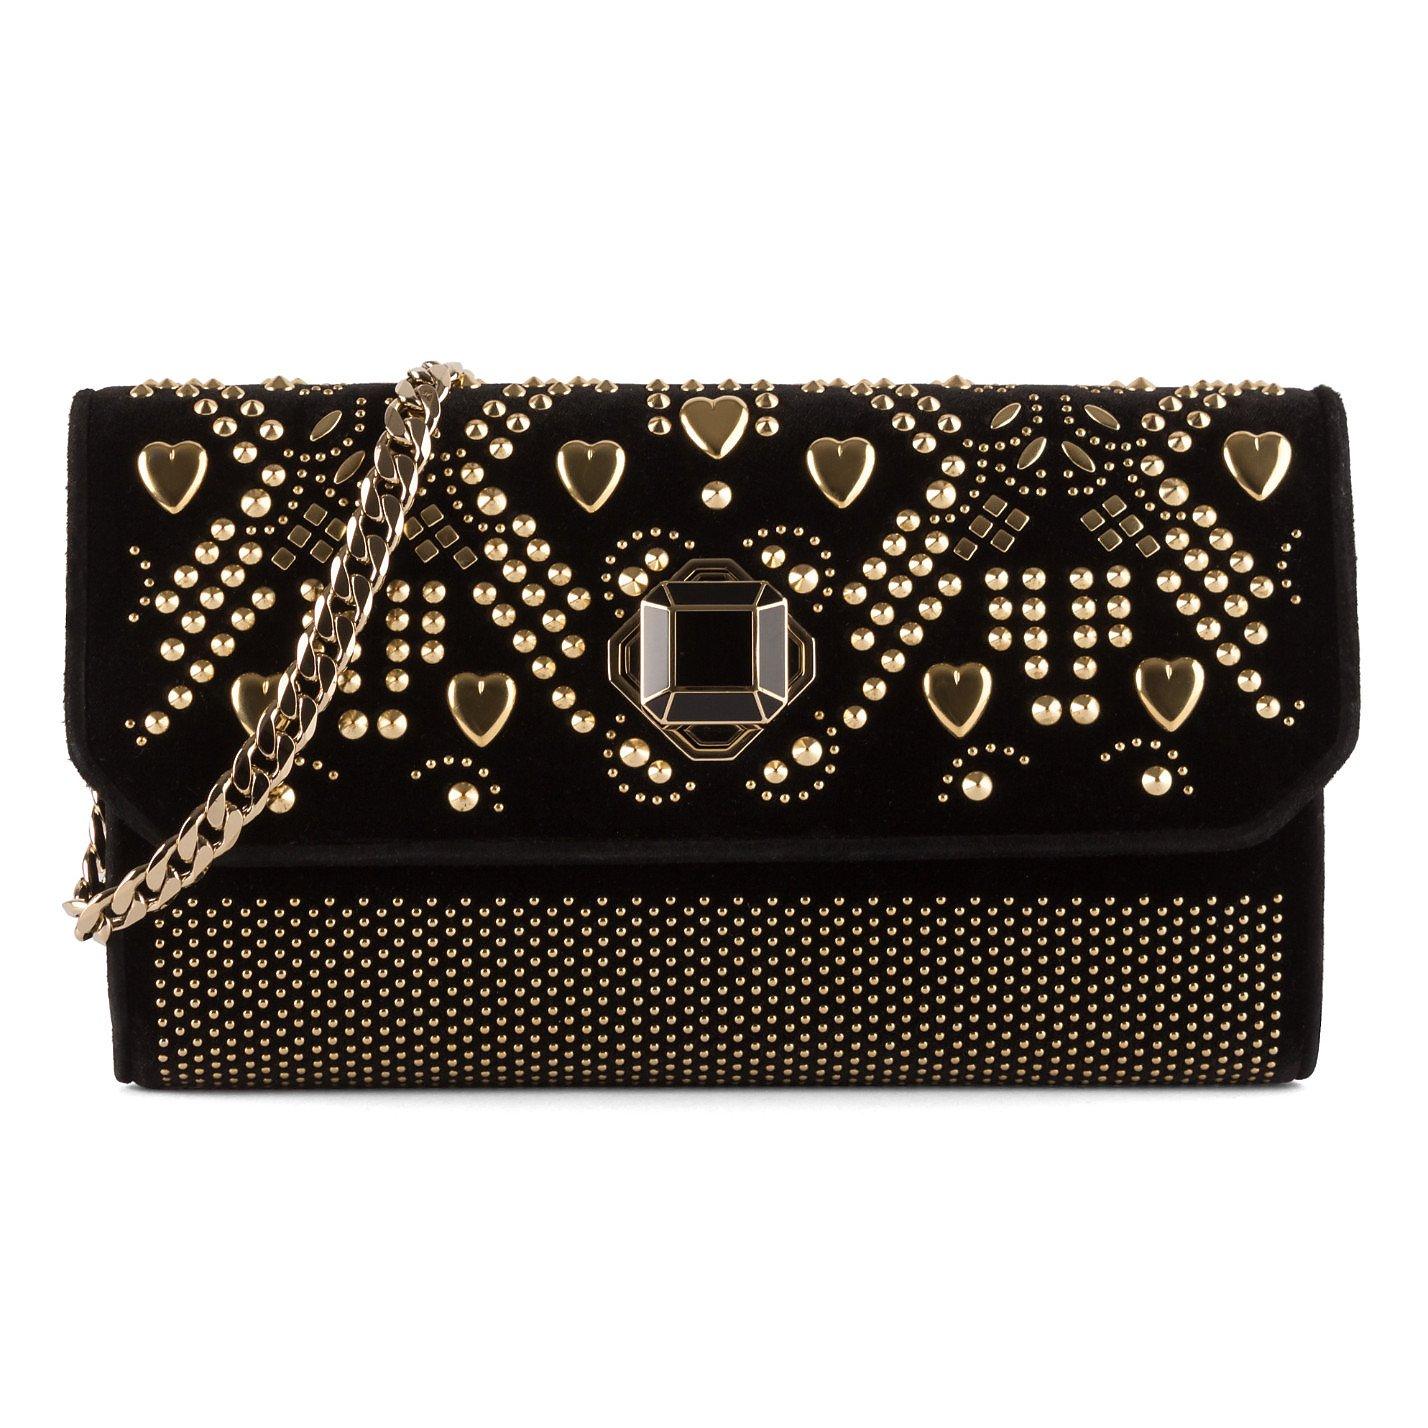 Elie Saab Studded Velvet Bag